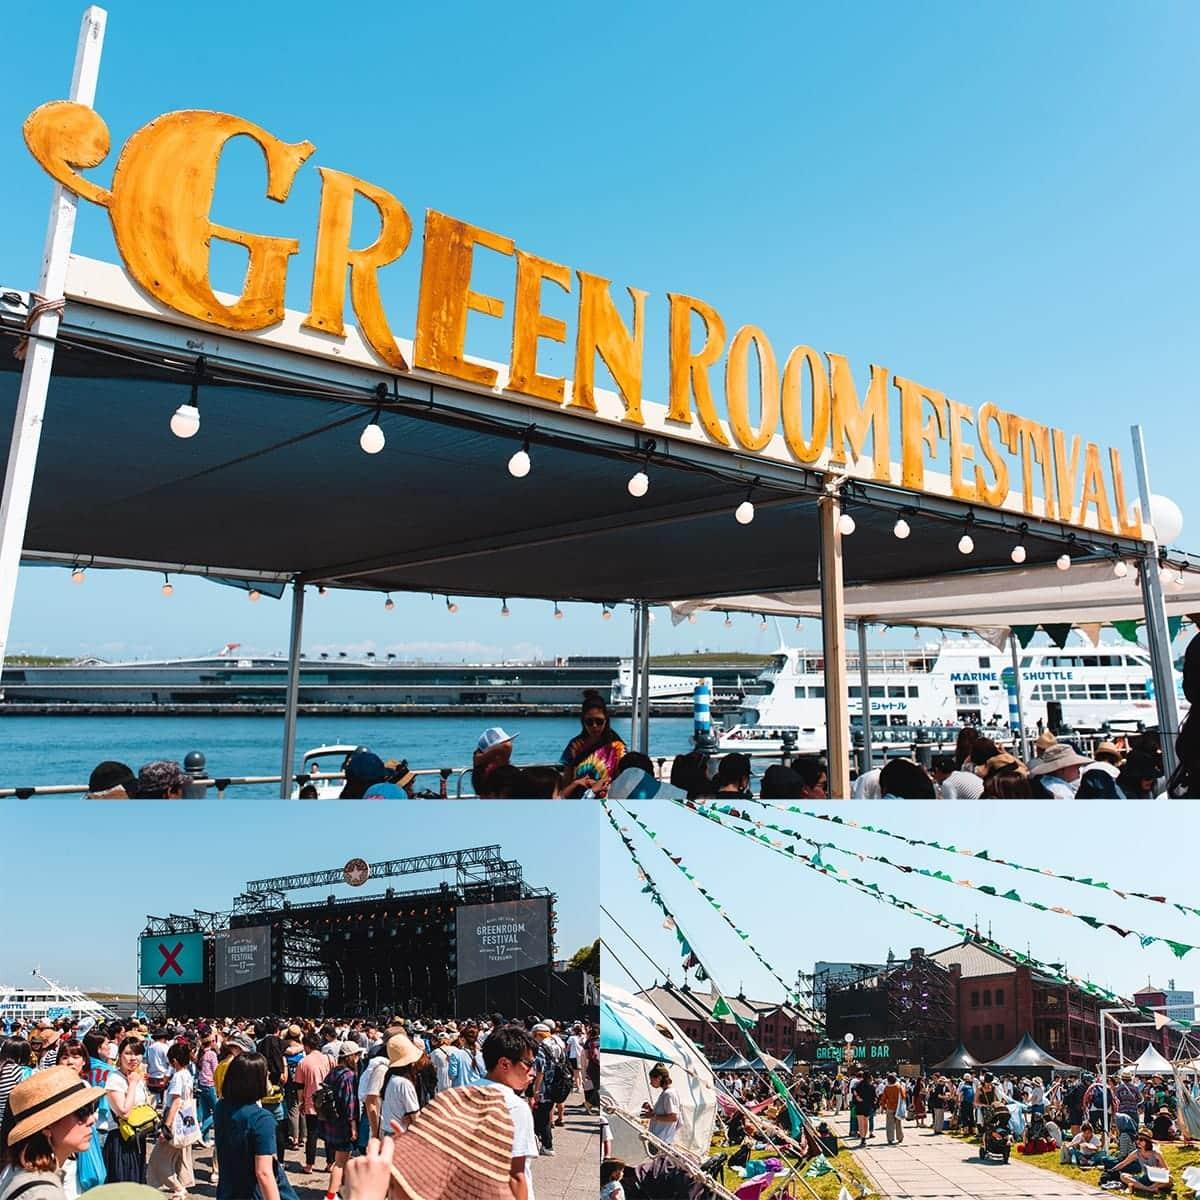 GREENROOM FESTIVAL'17<グリーンルーム フェスティバル>で開催のHOUSE OF VANS<ハウス オブ ヴァンズ>イベントレポート!